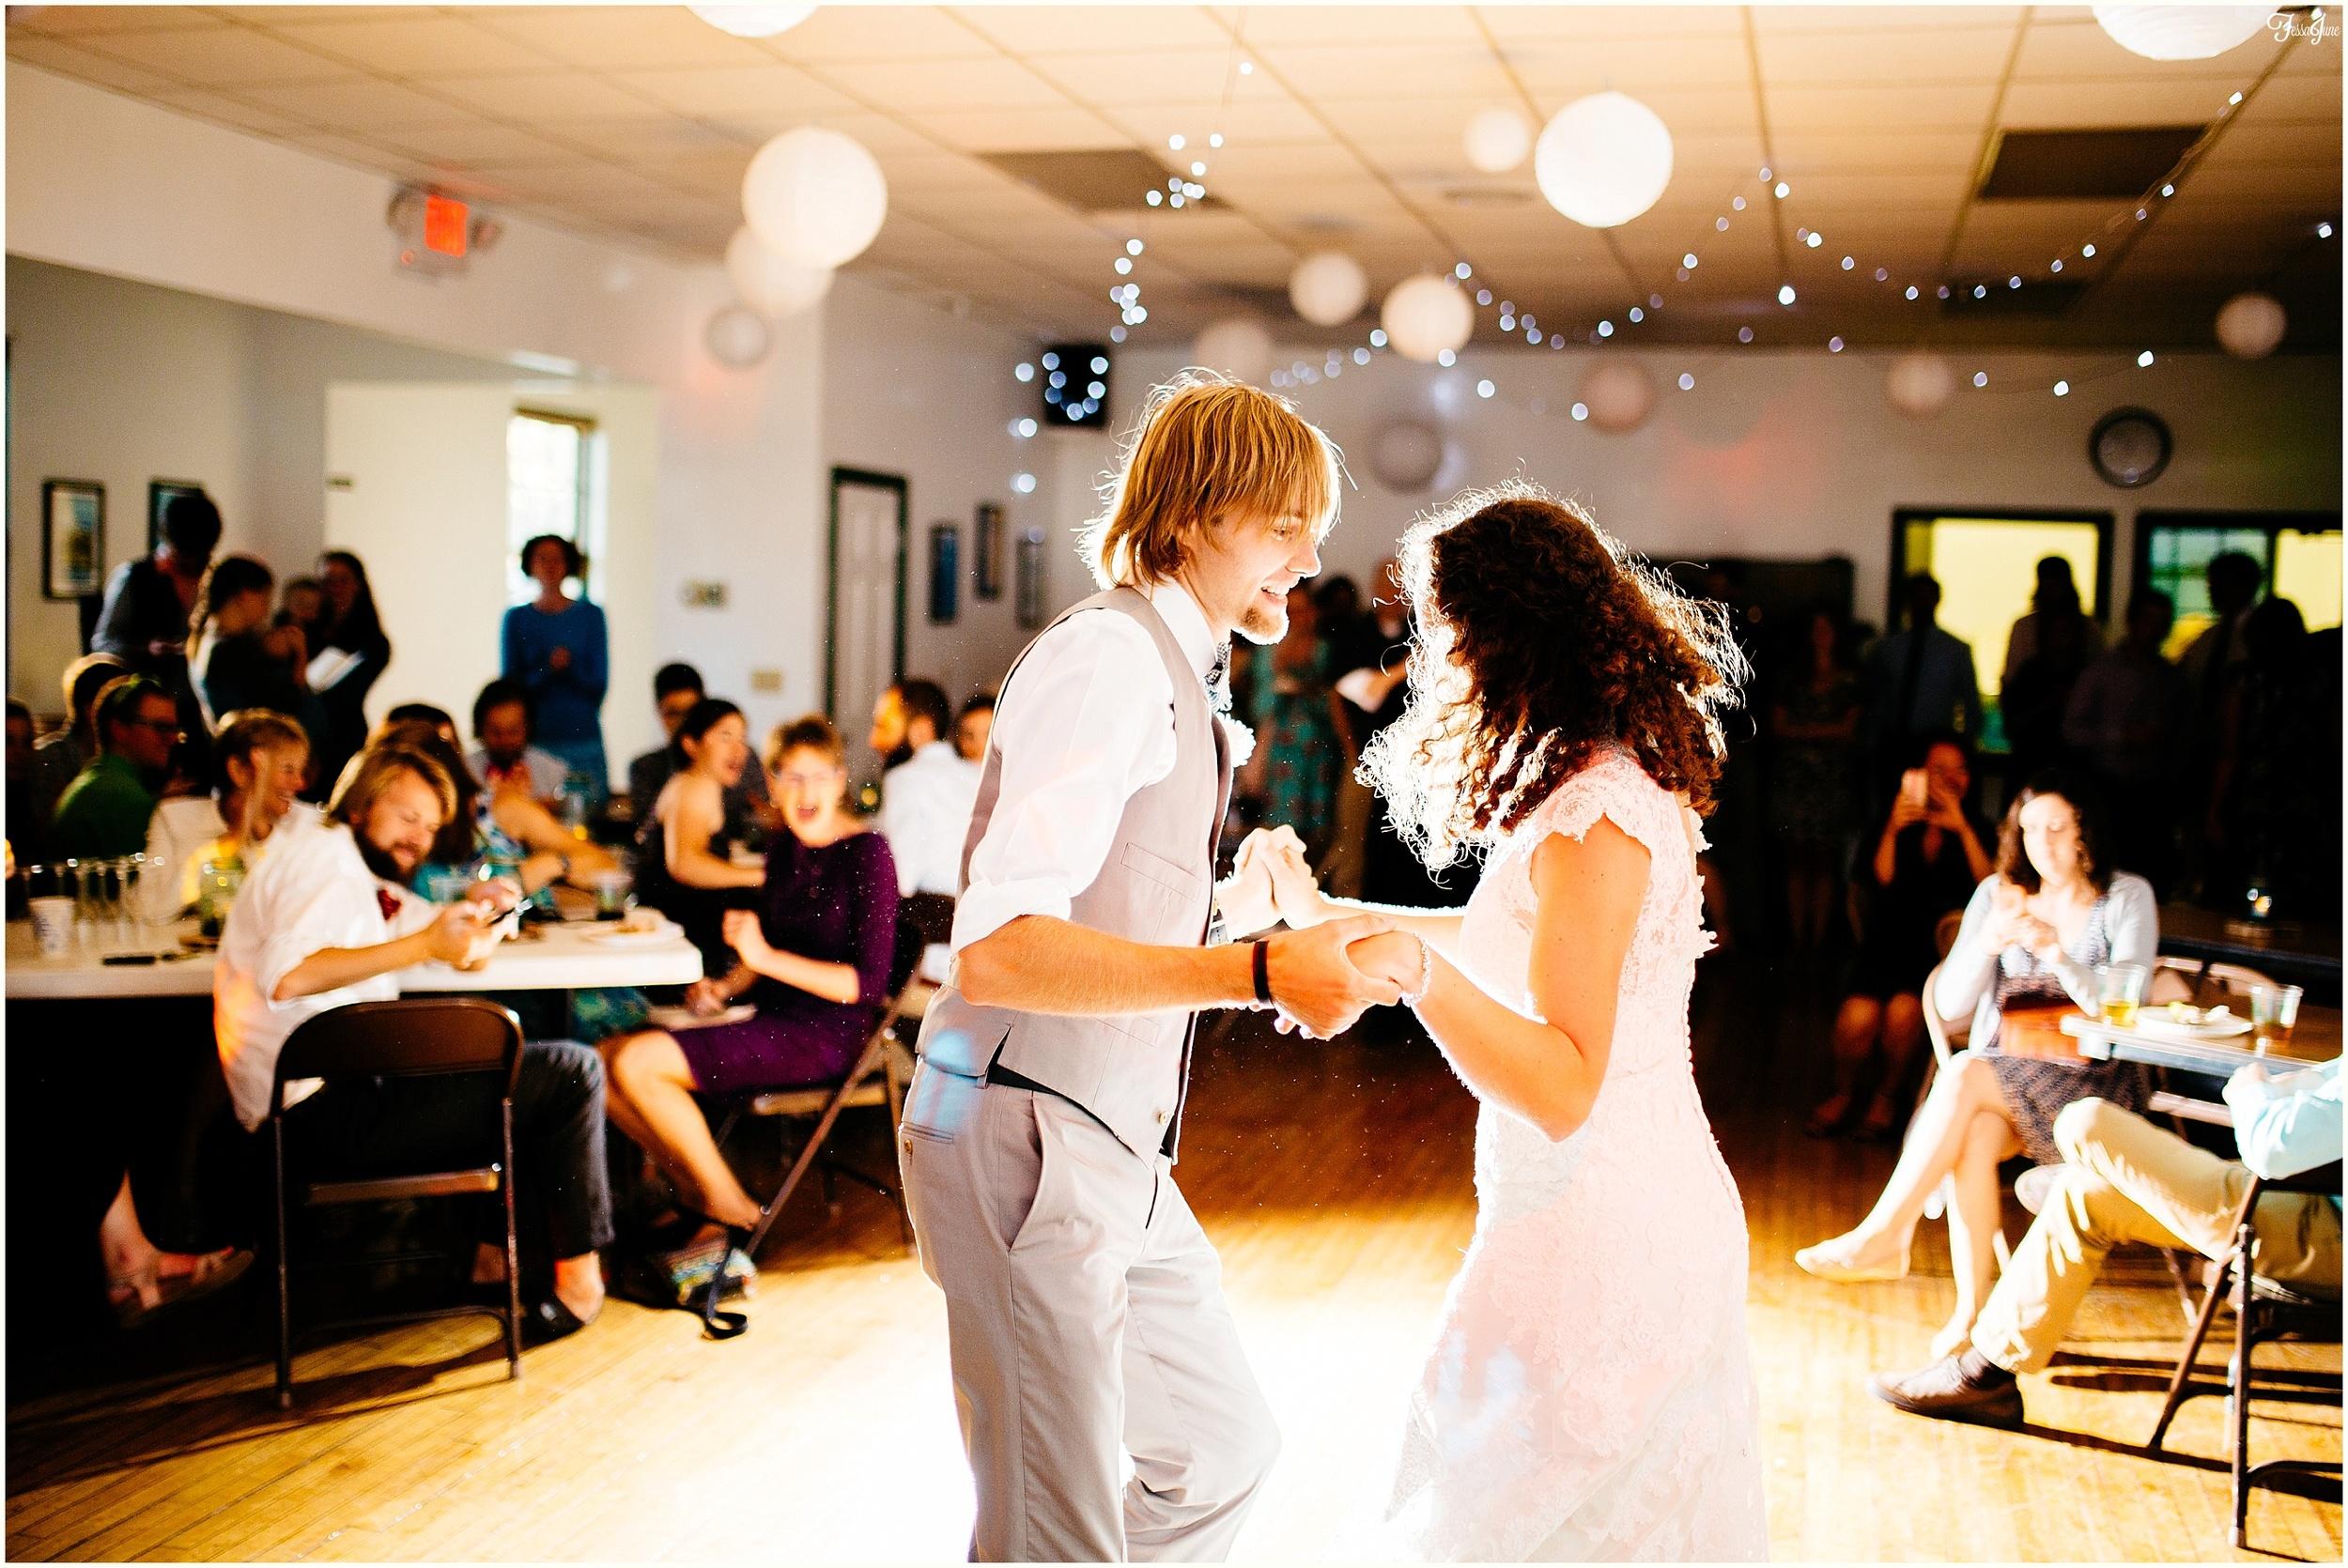 north-shore-duluth-minnesota-beach-wedding-9632.jpg